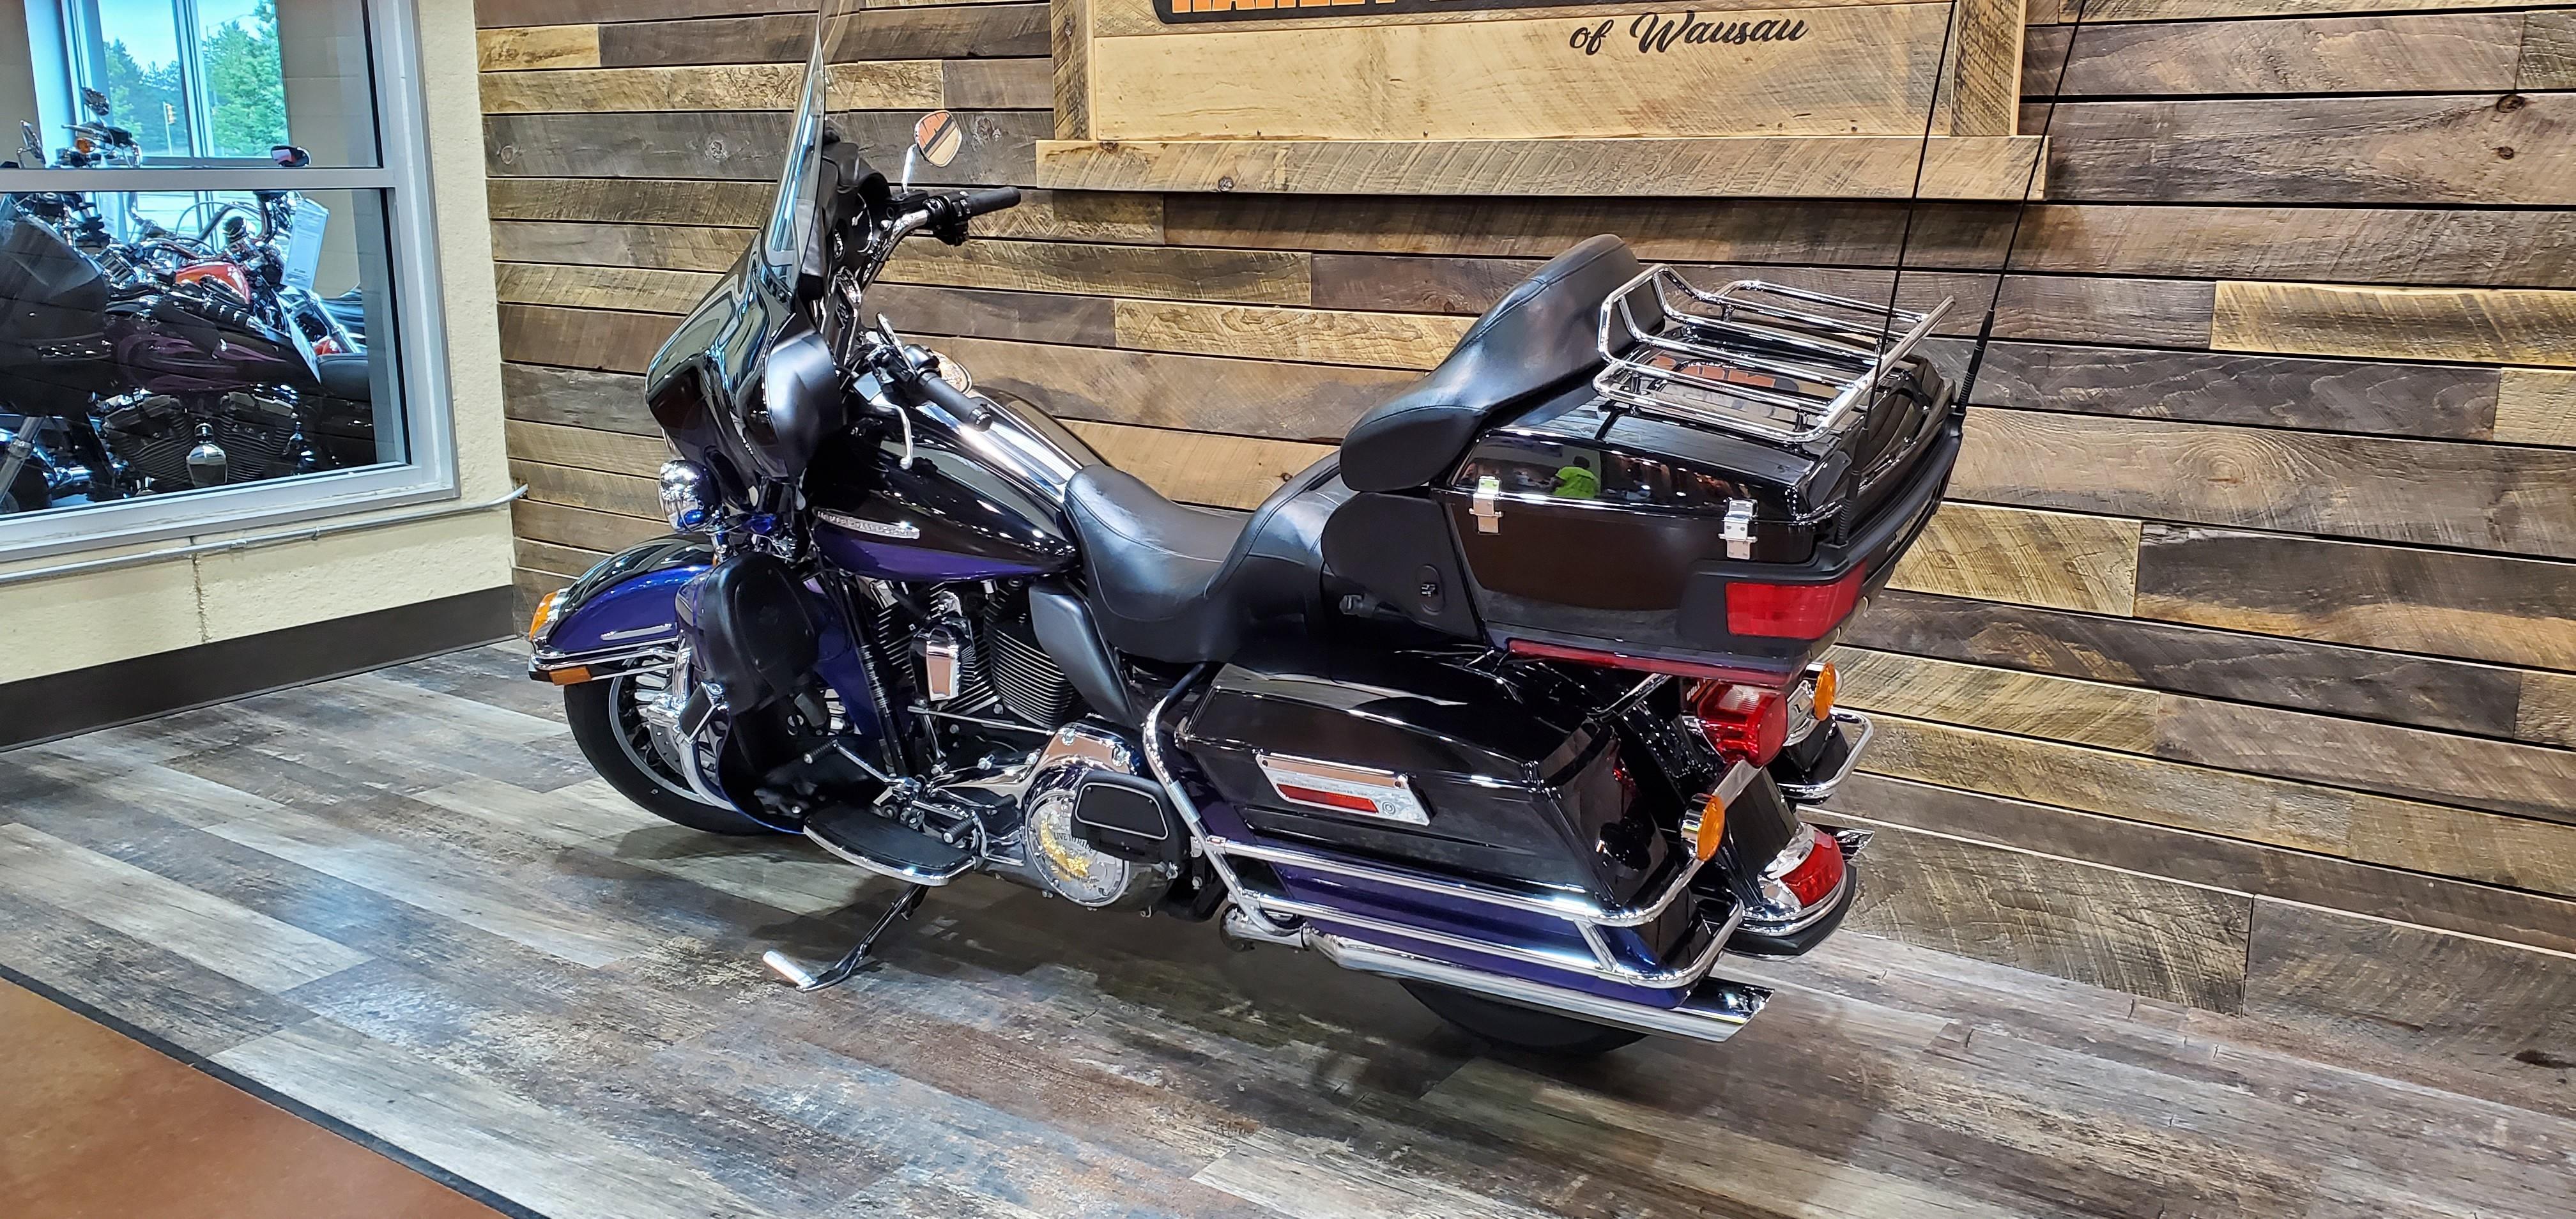 2010 Harley-Davidson Electra Glide Ultra Limited at Bull Falls Harley-Davidson